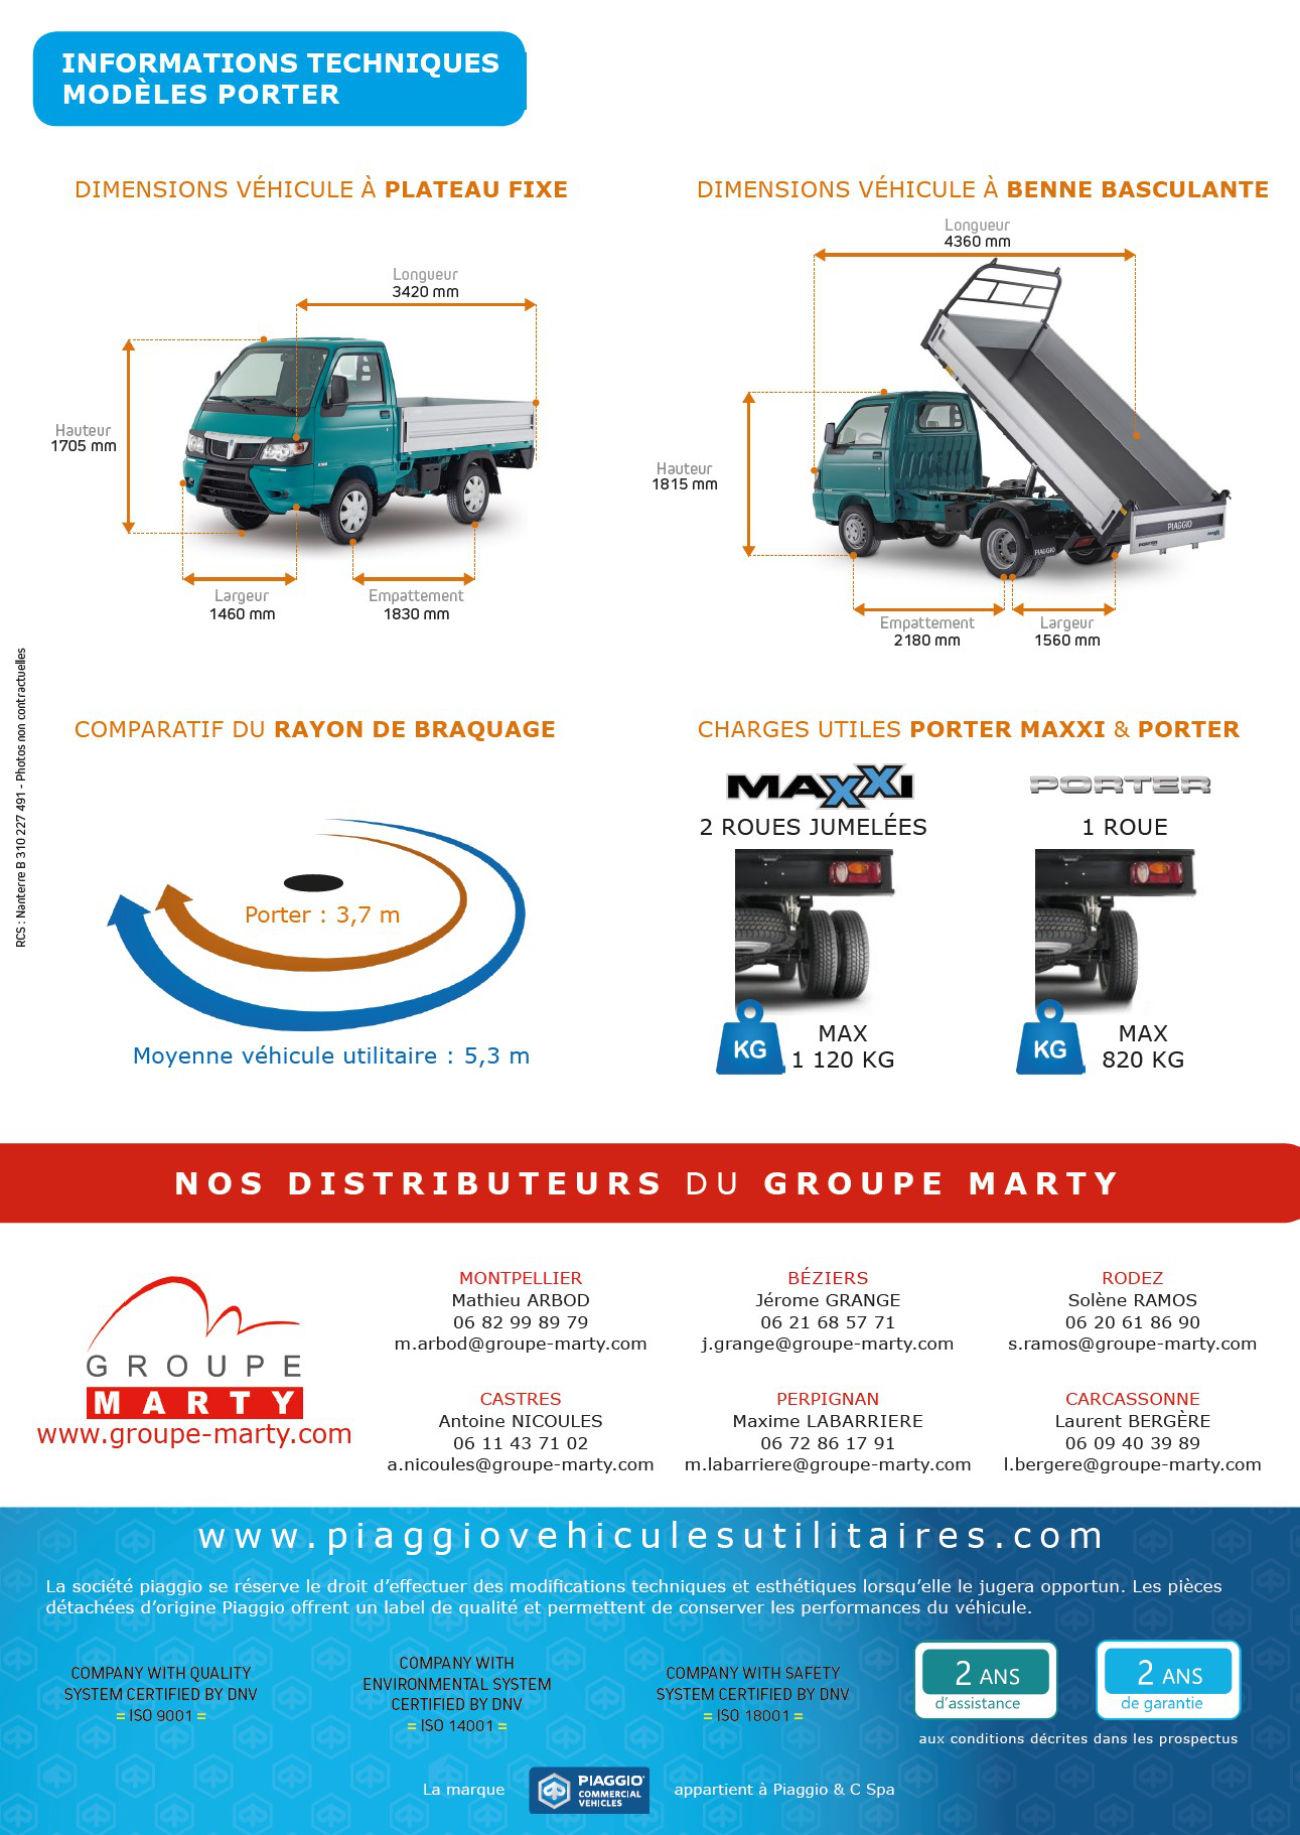 Prospectus verso de promotion du camion Piaggio Porter